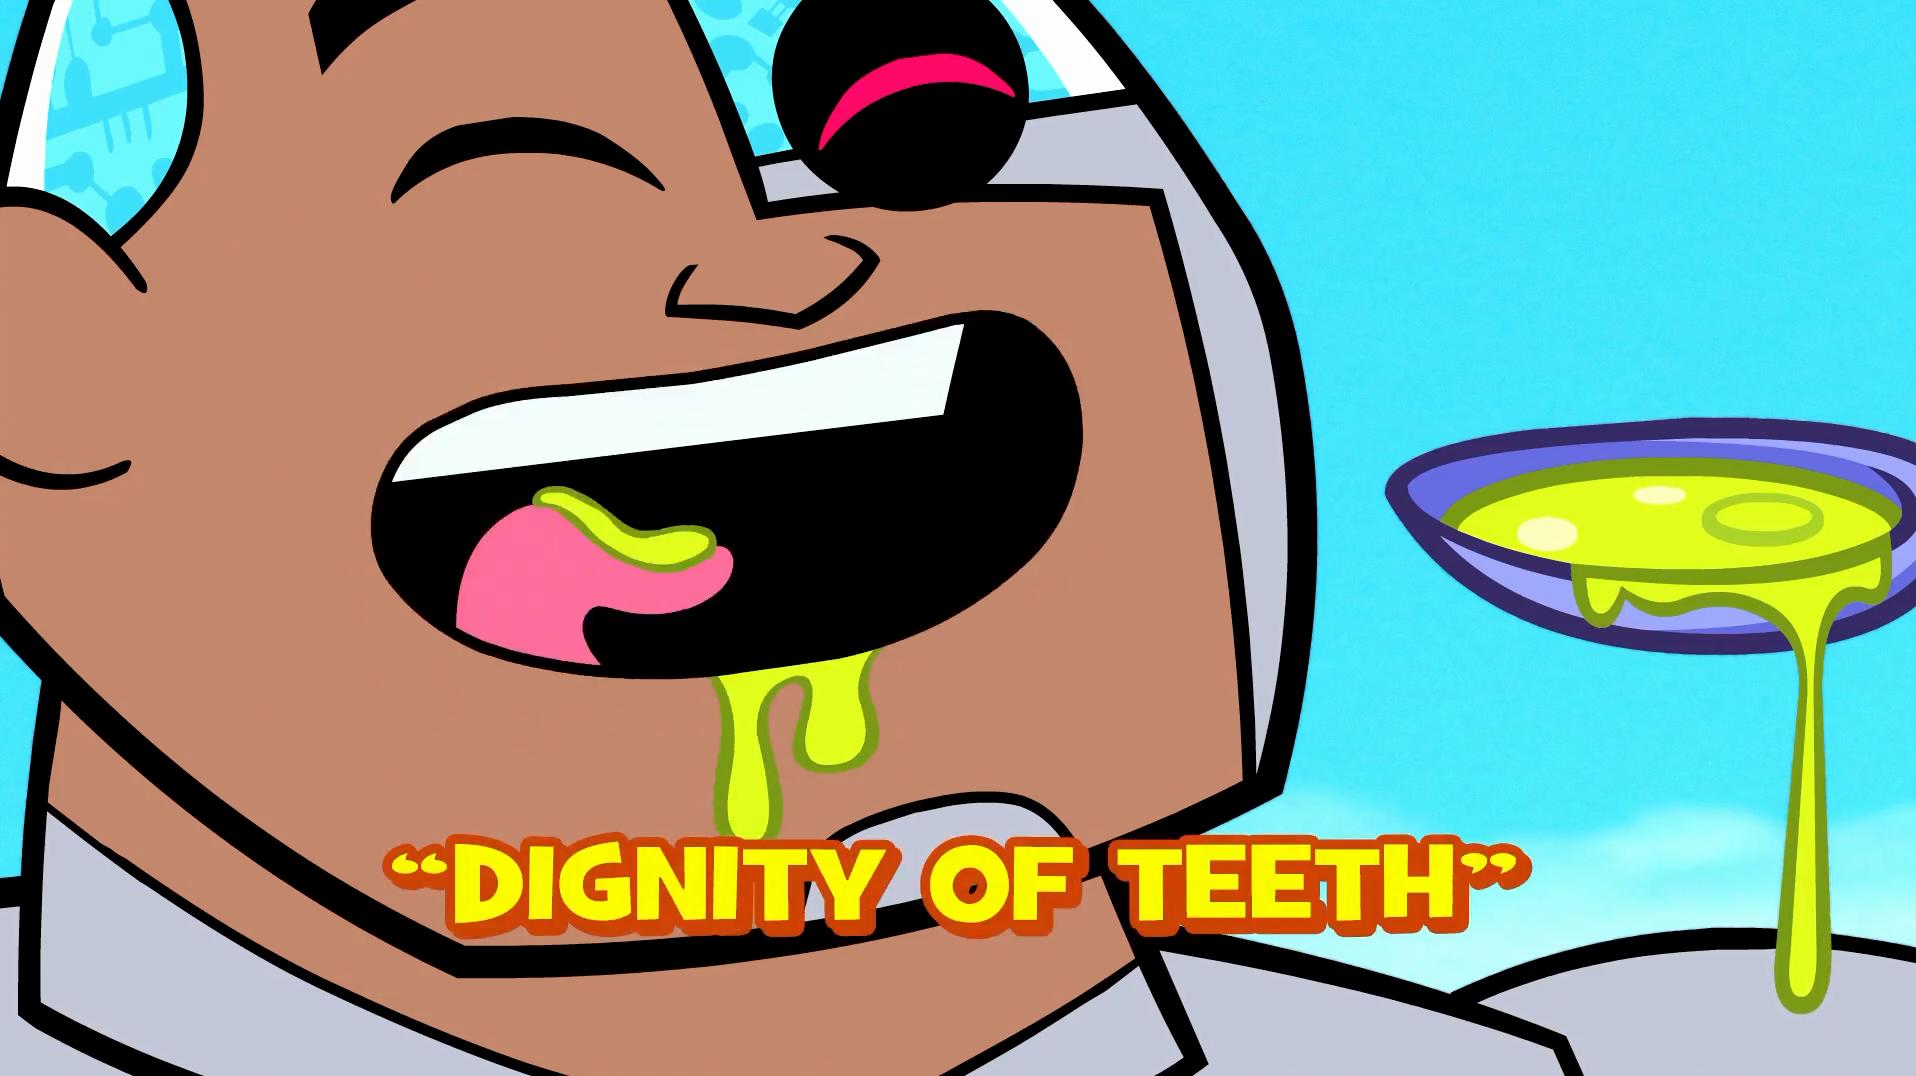 Dignity of Teeth